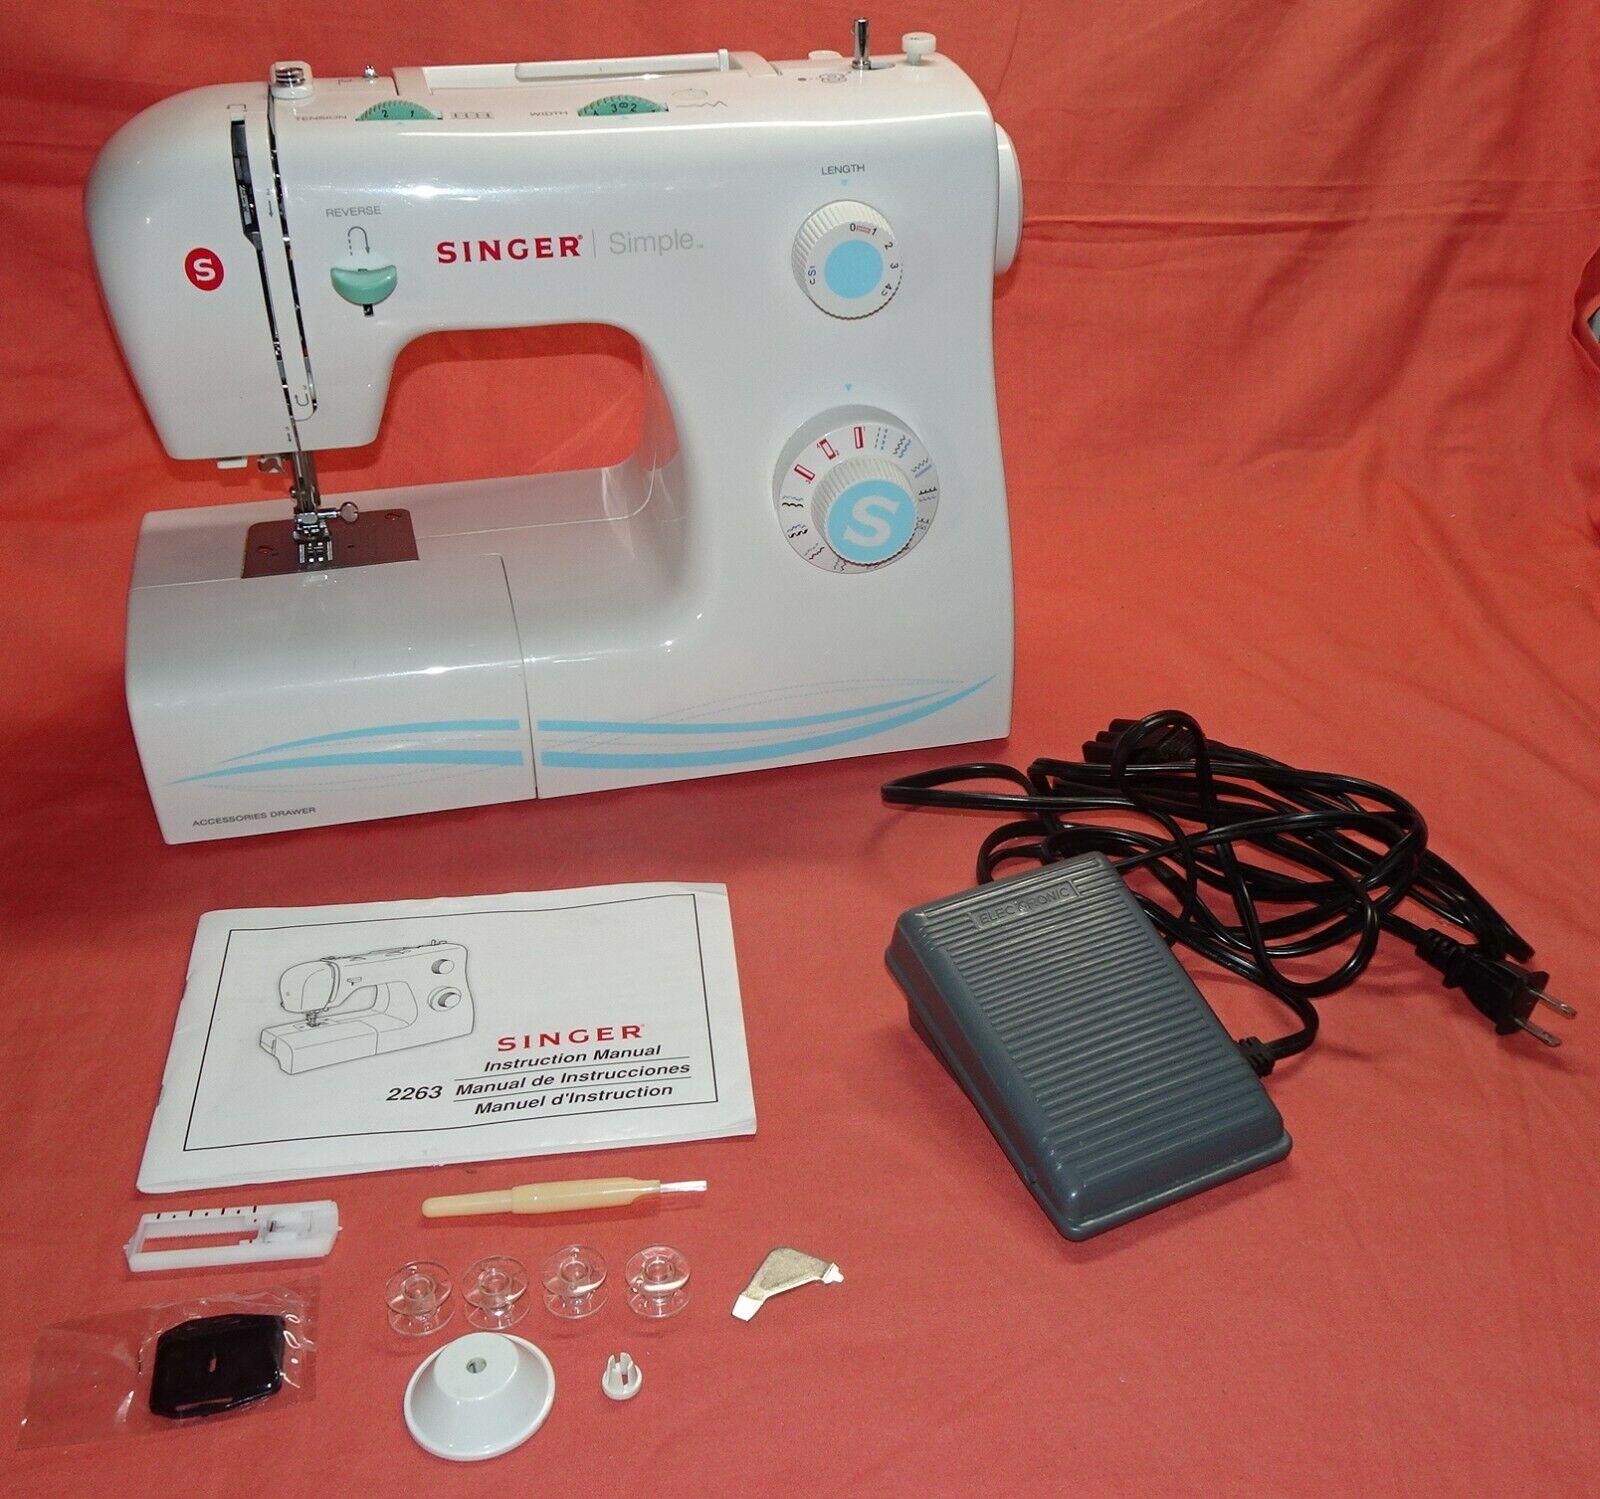 s l1600 - SINGER SIMPLE SEWING MACHINE = MODEL 50T8 E99670